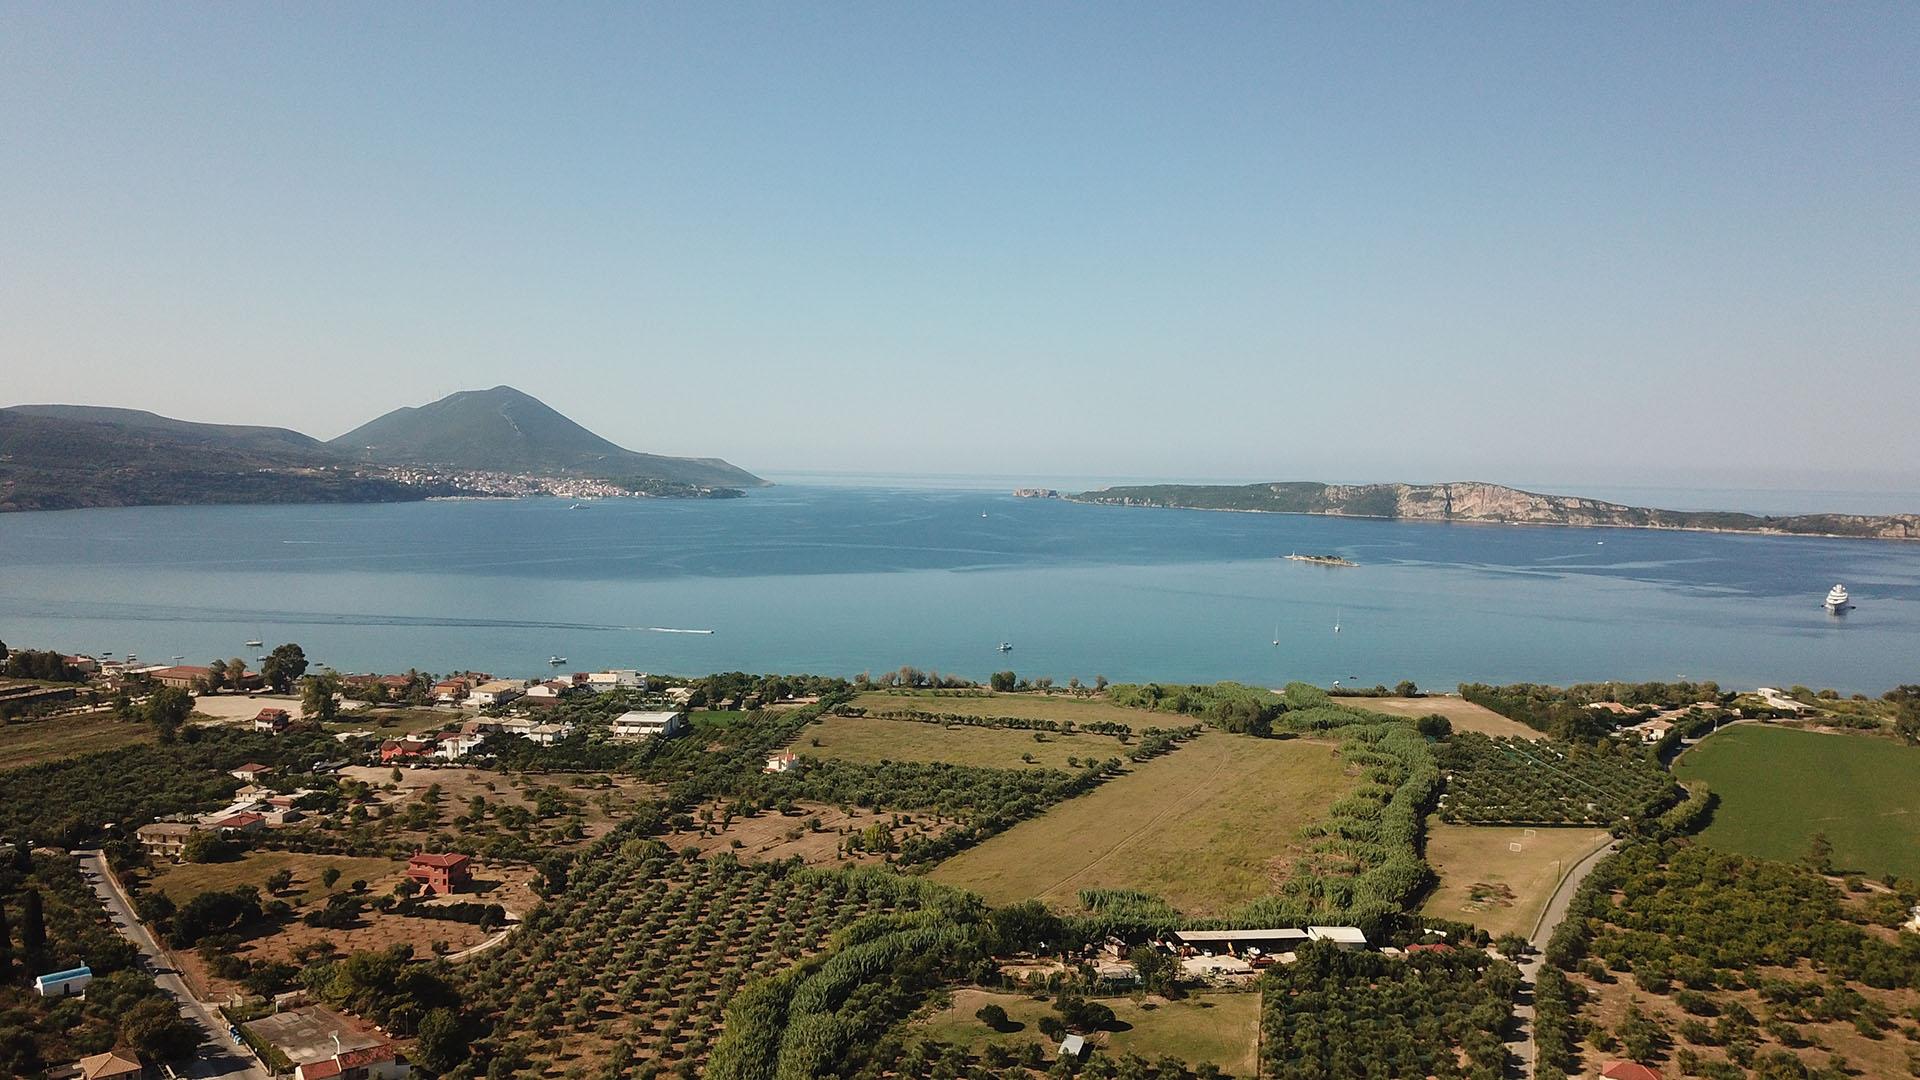 Tsaglis Extra Virgin Olive Oil - Kalamata Messinia - Pylos - Gialova - Southwest Peloponnese